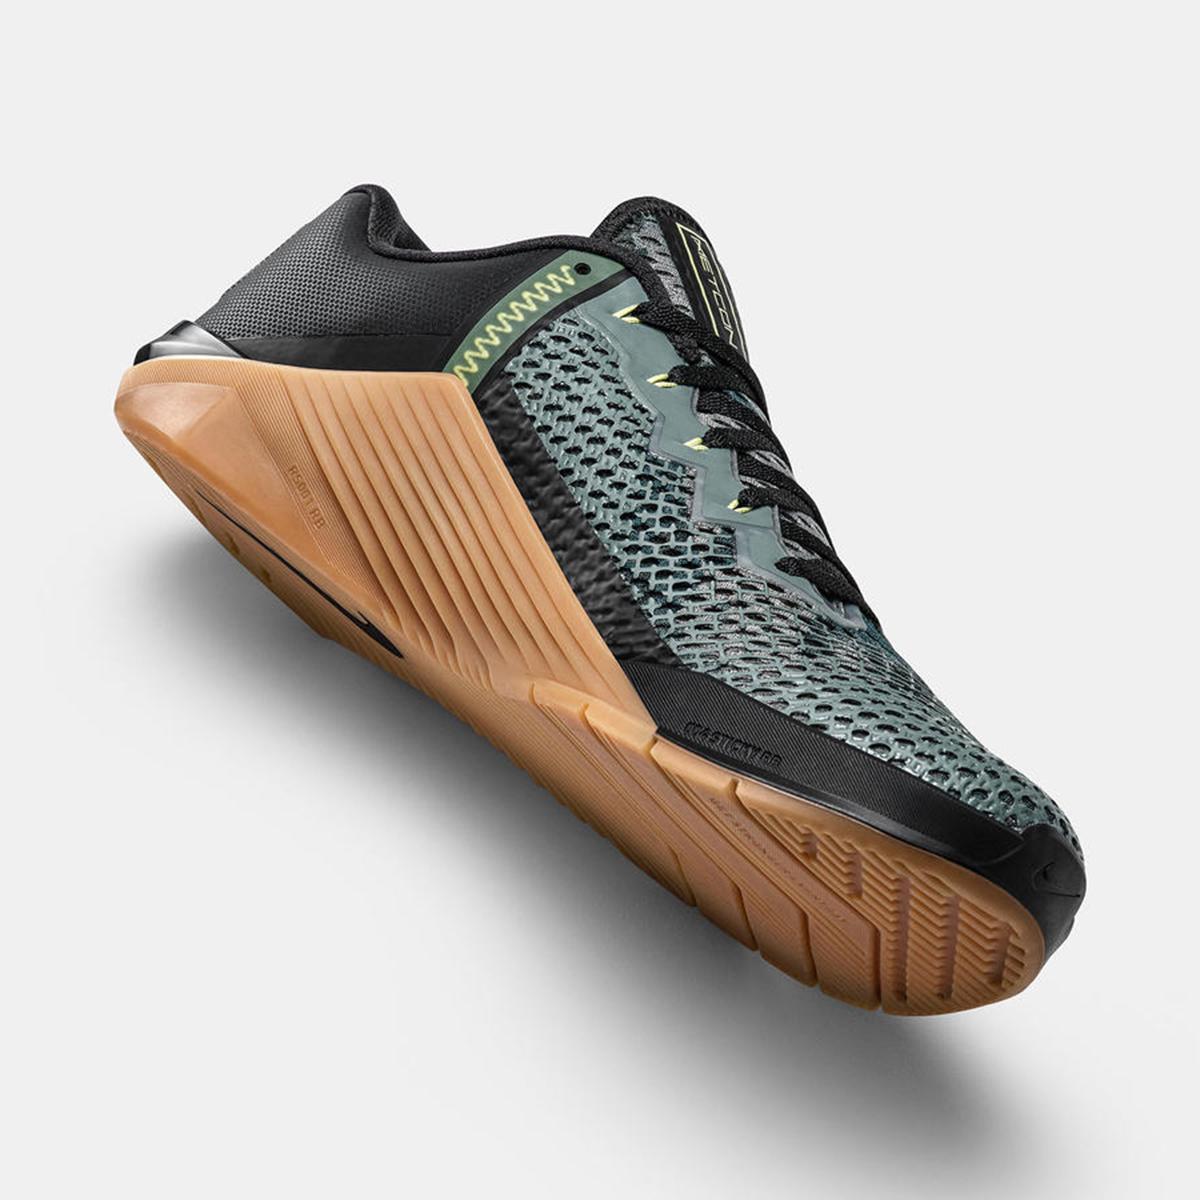 Men's Nike Metcon 6 Training Shoes - Color: Valerian Blue - Size: 3.5 - Width: Regular, Valerian Blue, large, image 5